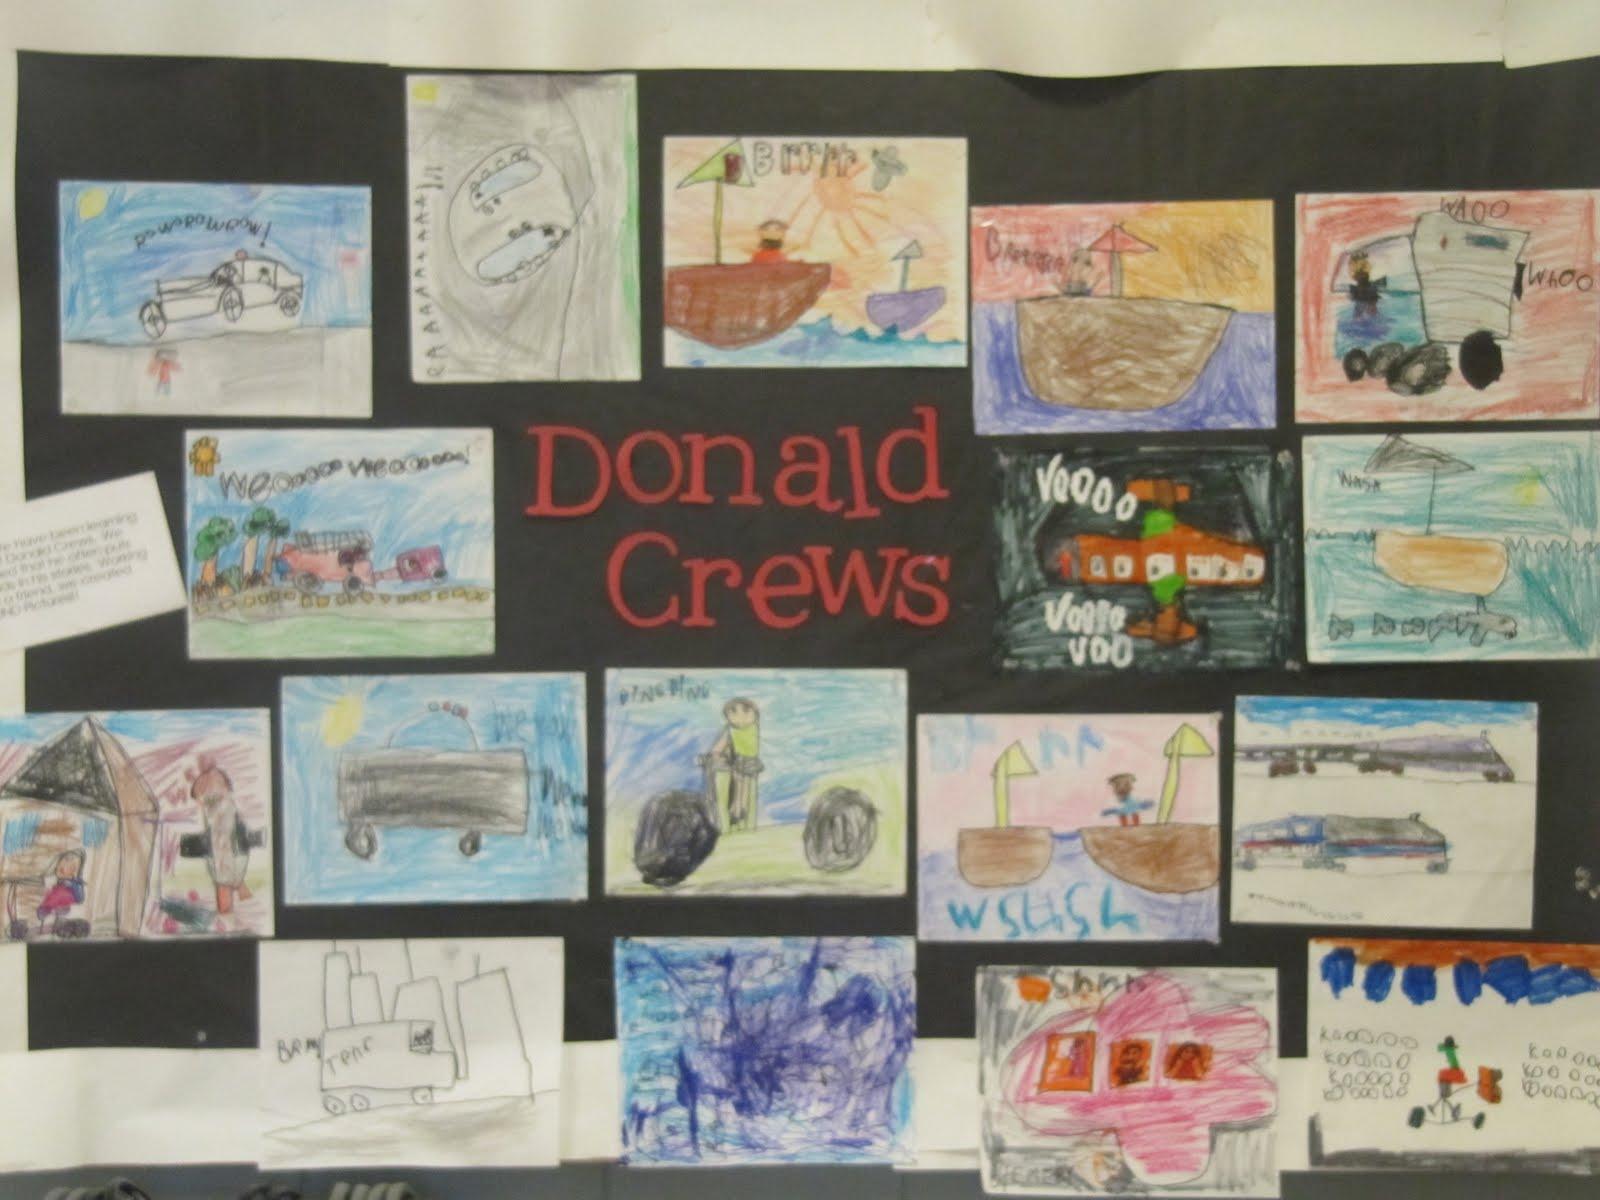 30 Best Donald crews author study images | Author studies ...